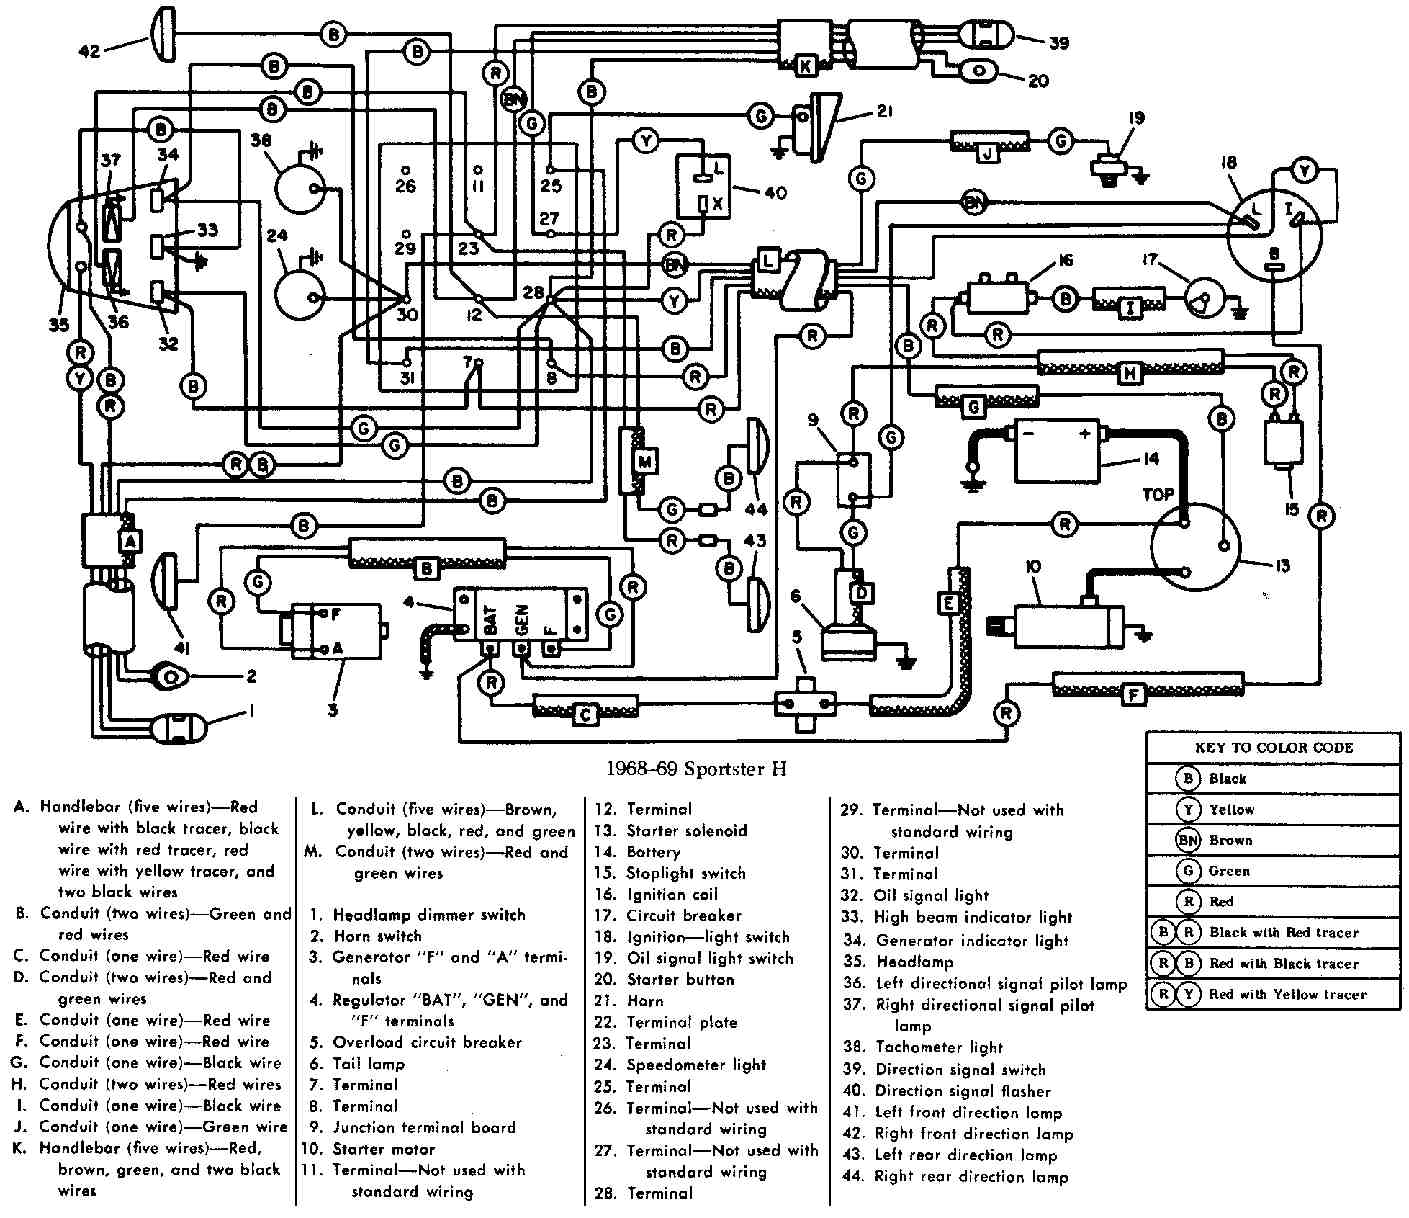 E320 Wiring Diagram Detailed Schematics Wire Mercedes Page 4 And Ecu